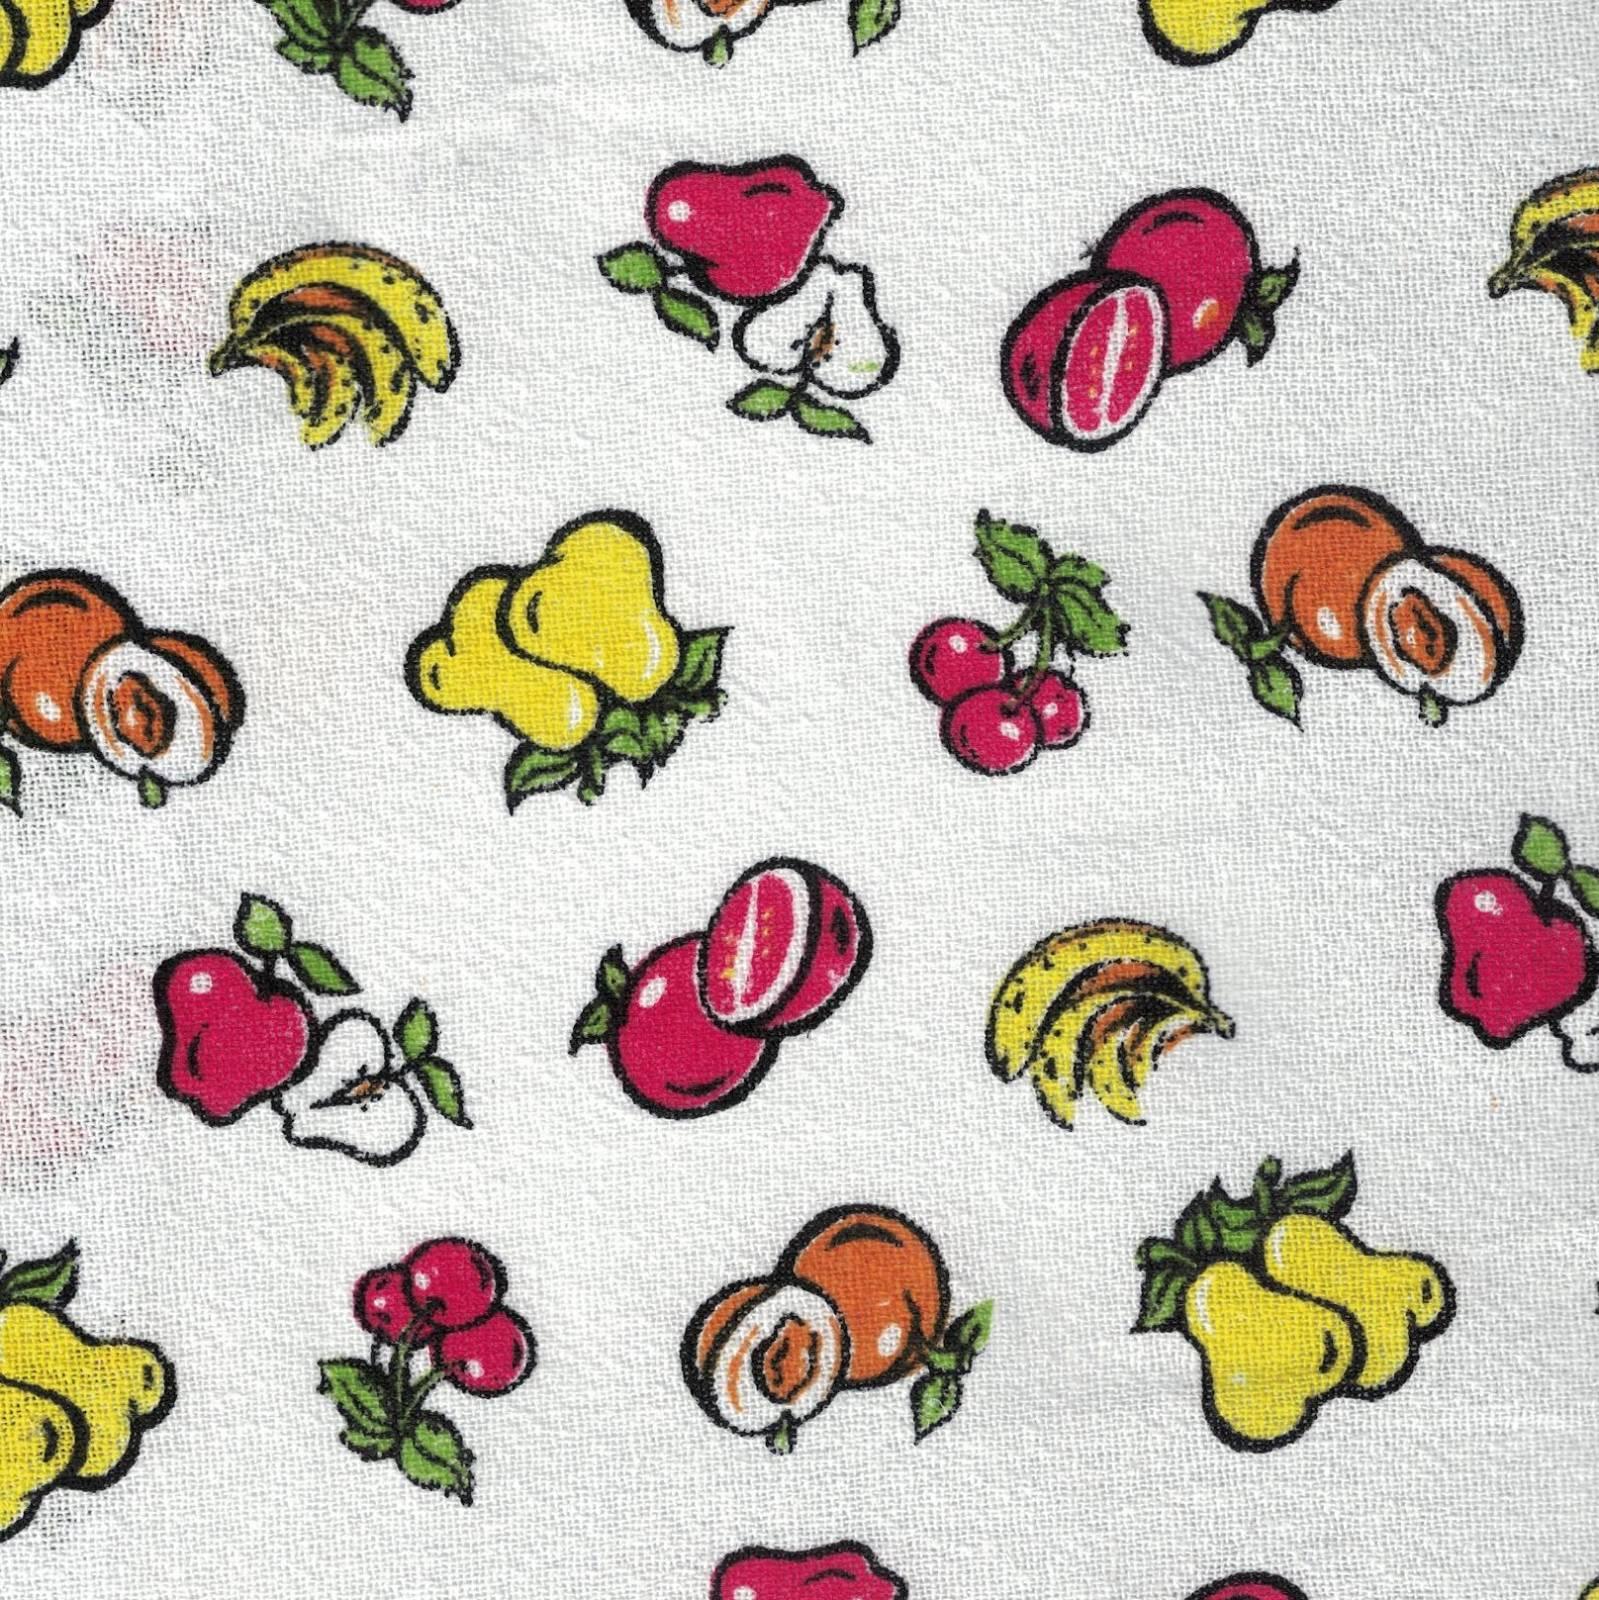 Sacaria Estampada Frutinhas Ref. 5520 Santa Margarida - Armarinhos Nodari